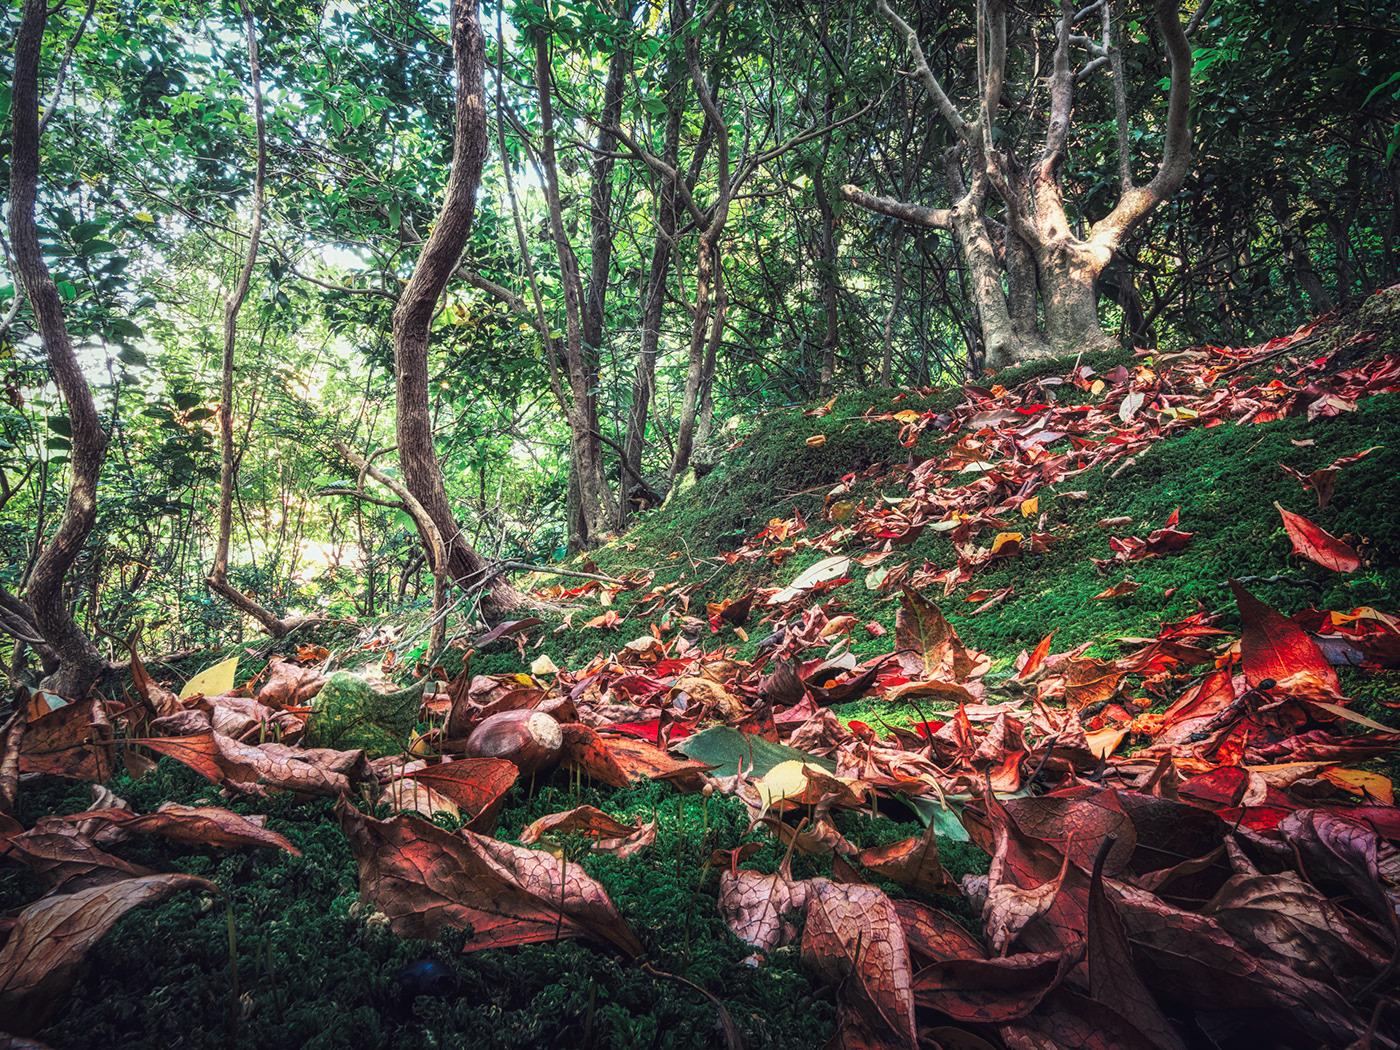 Autumn forest of dwarfs. Acorns are often lying around.